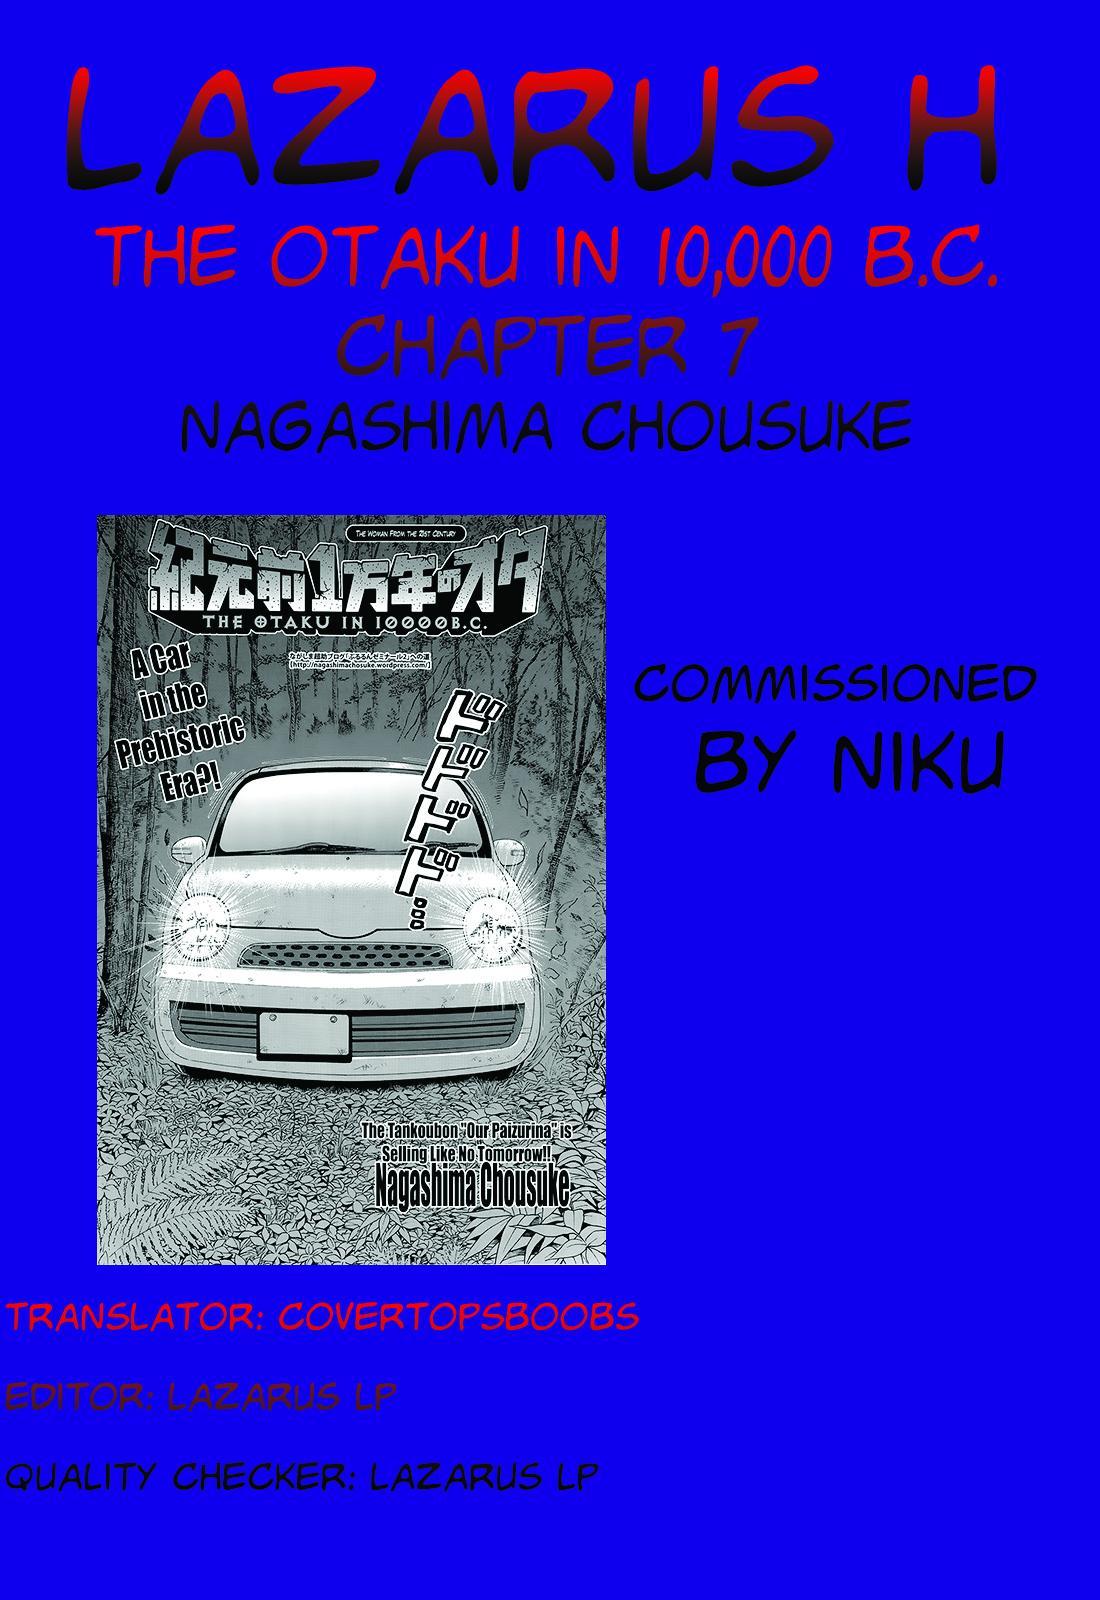 Kigenzen 10000 Nen no Ota | The Otaku in 10,000 B.C. 136